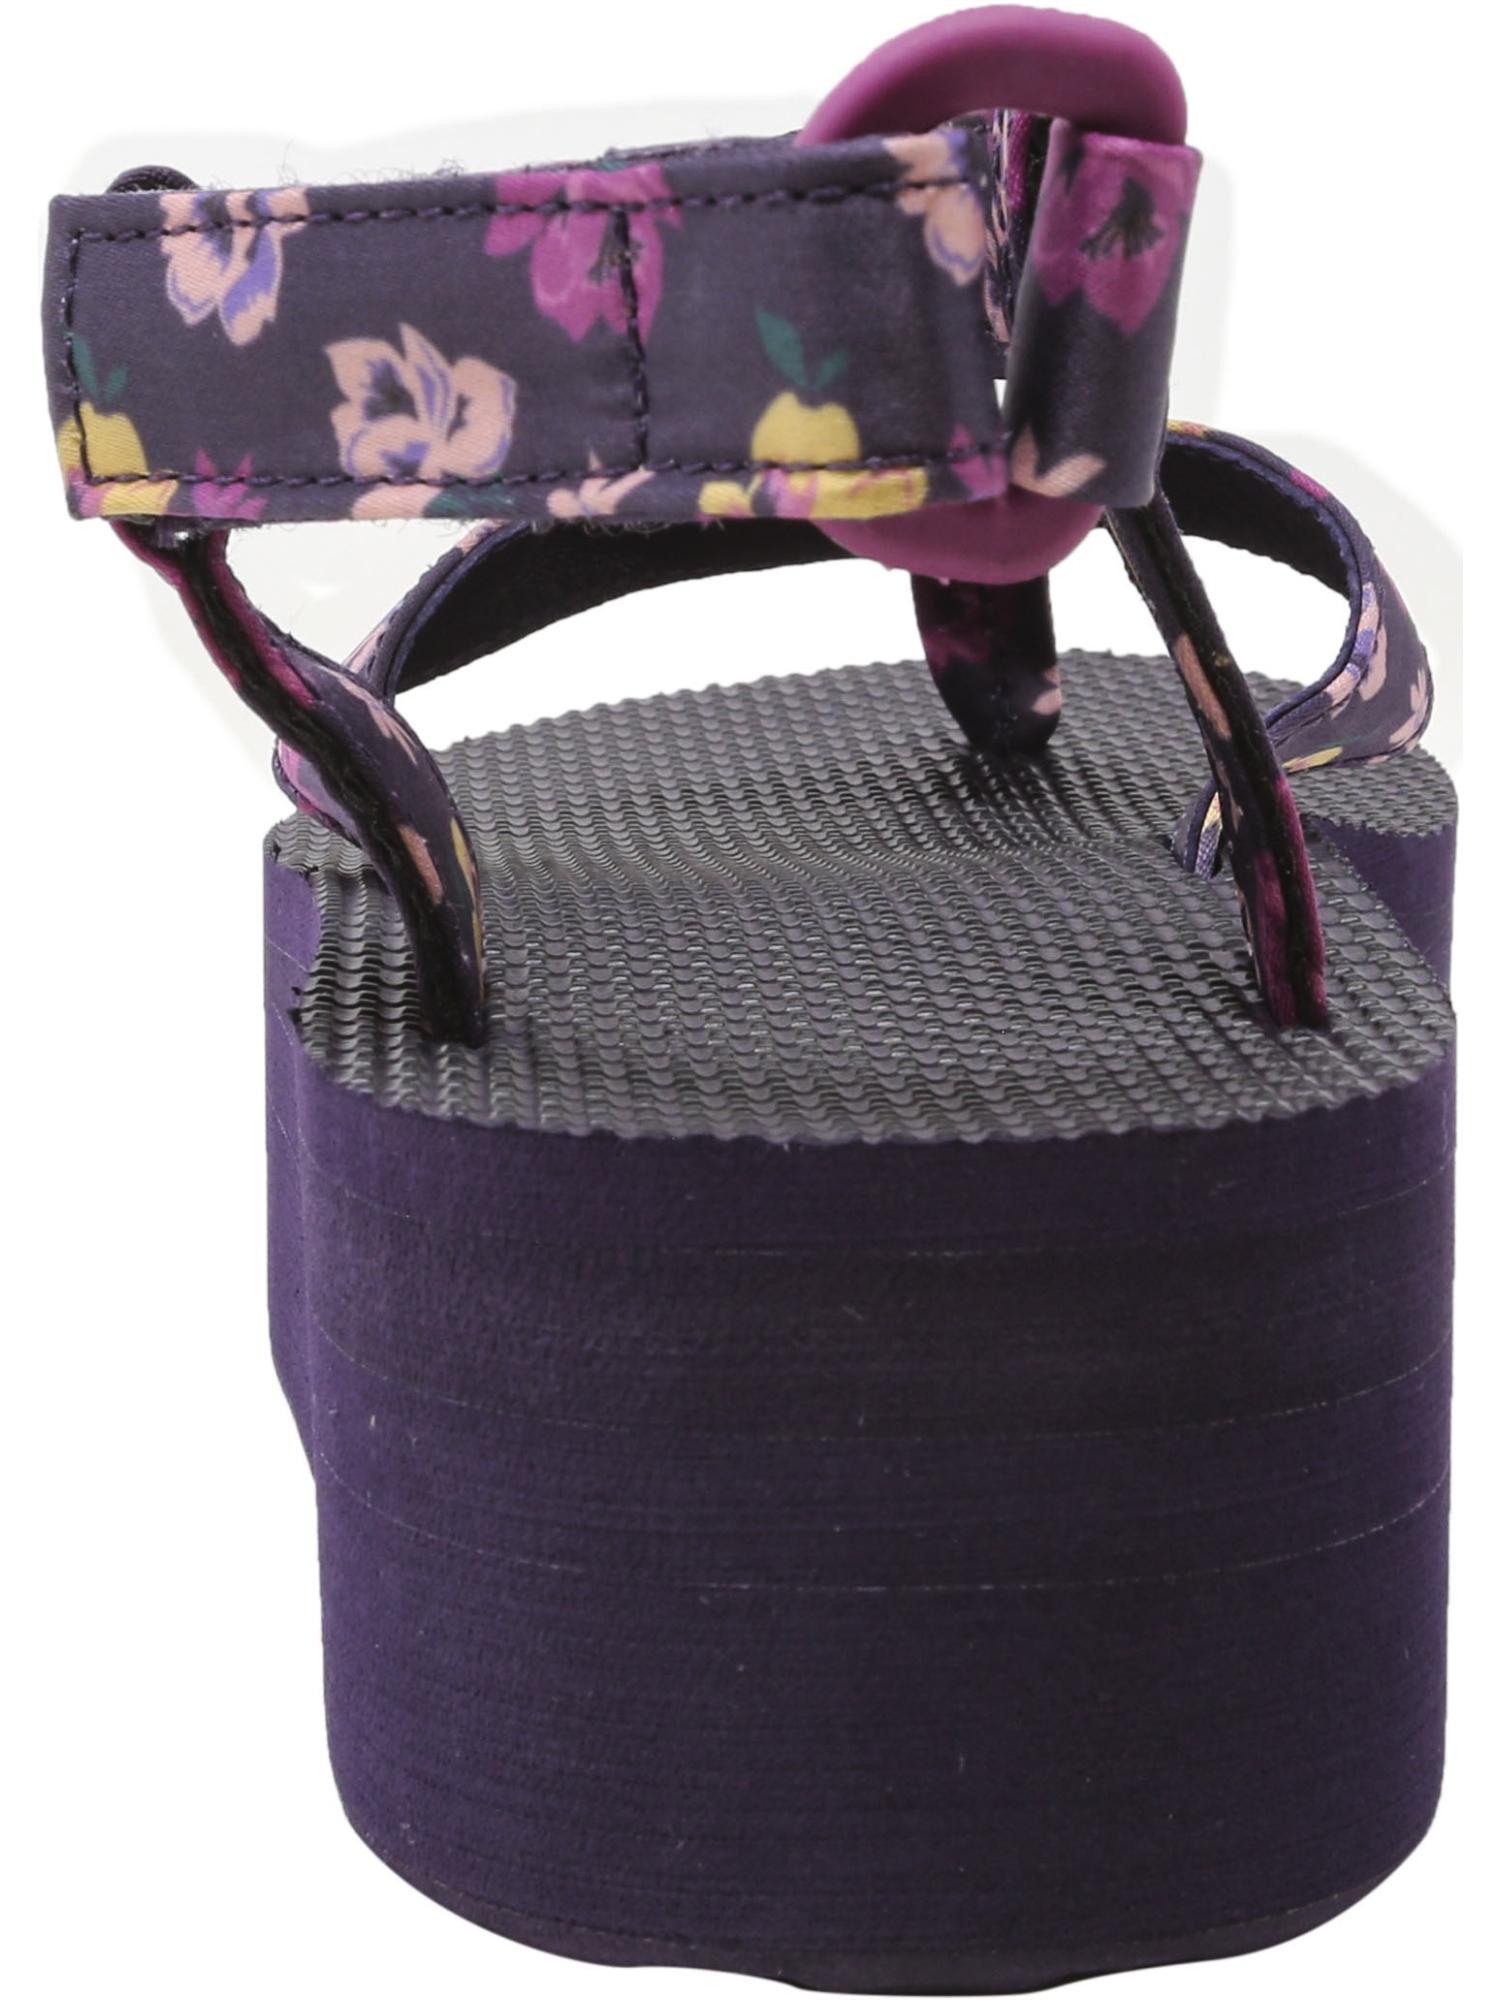 Teva-Women-039-s-Flatform-Sandal-Floral-Ankle-High thumbnail 15